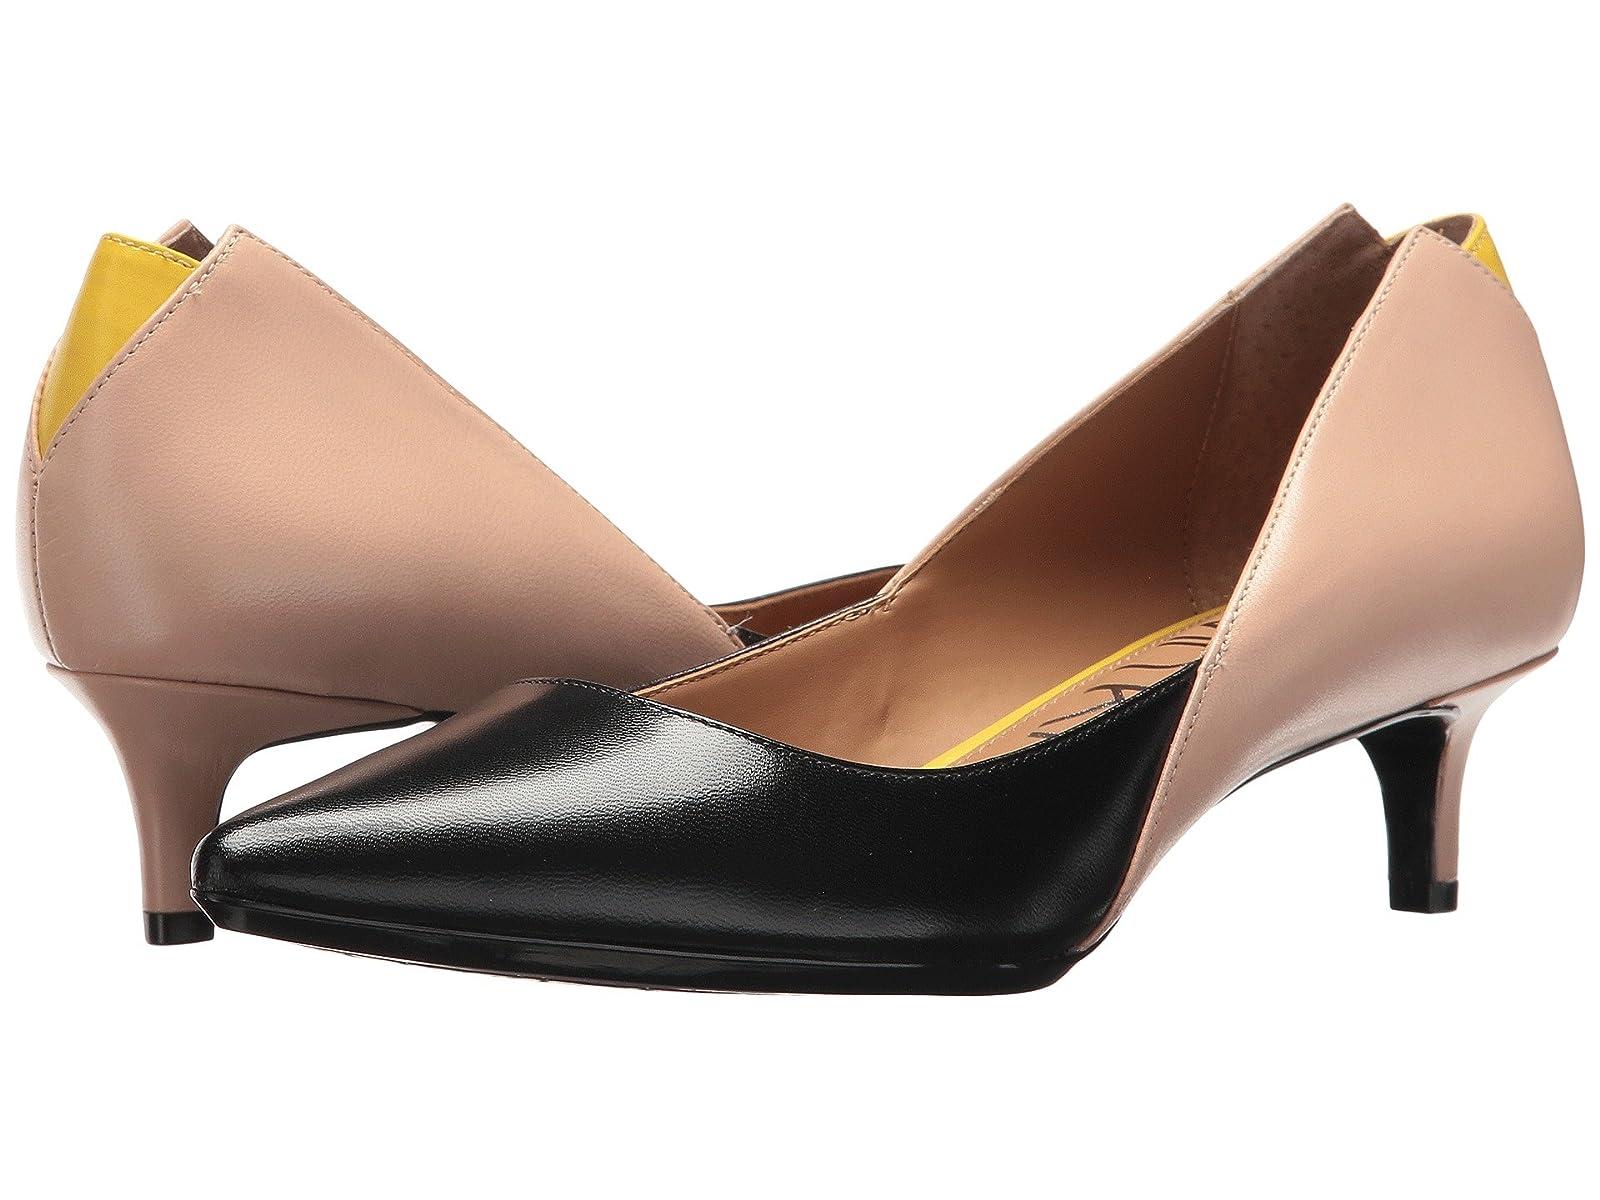 Calvin Klein GrayceCheap and distinctive eye-catching shoes